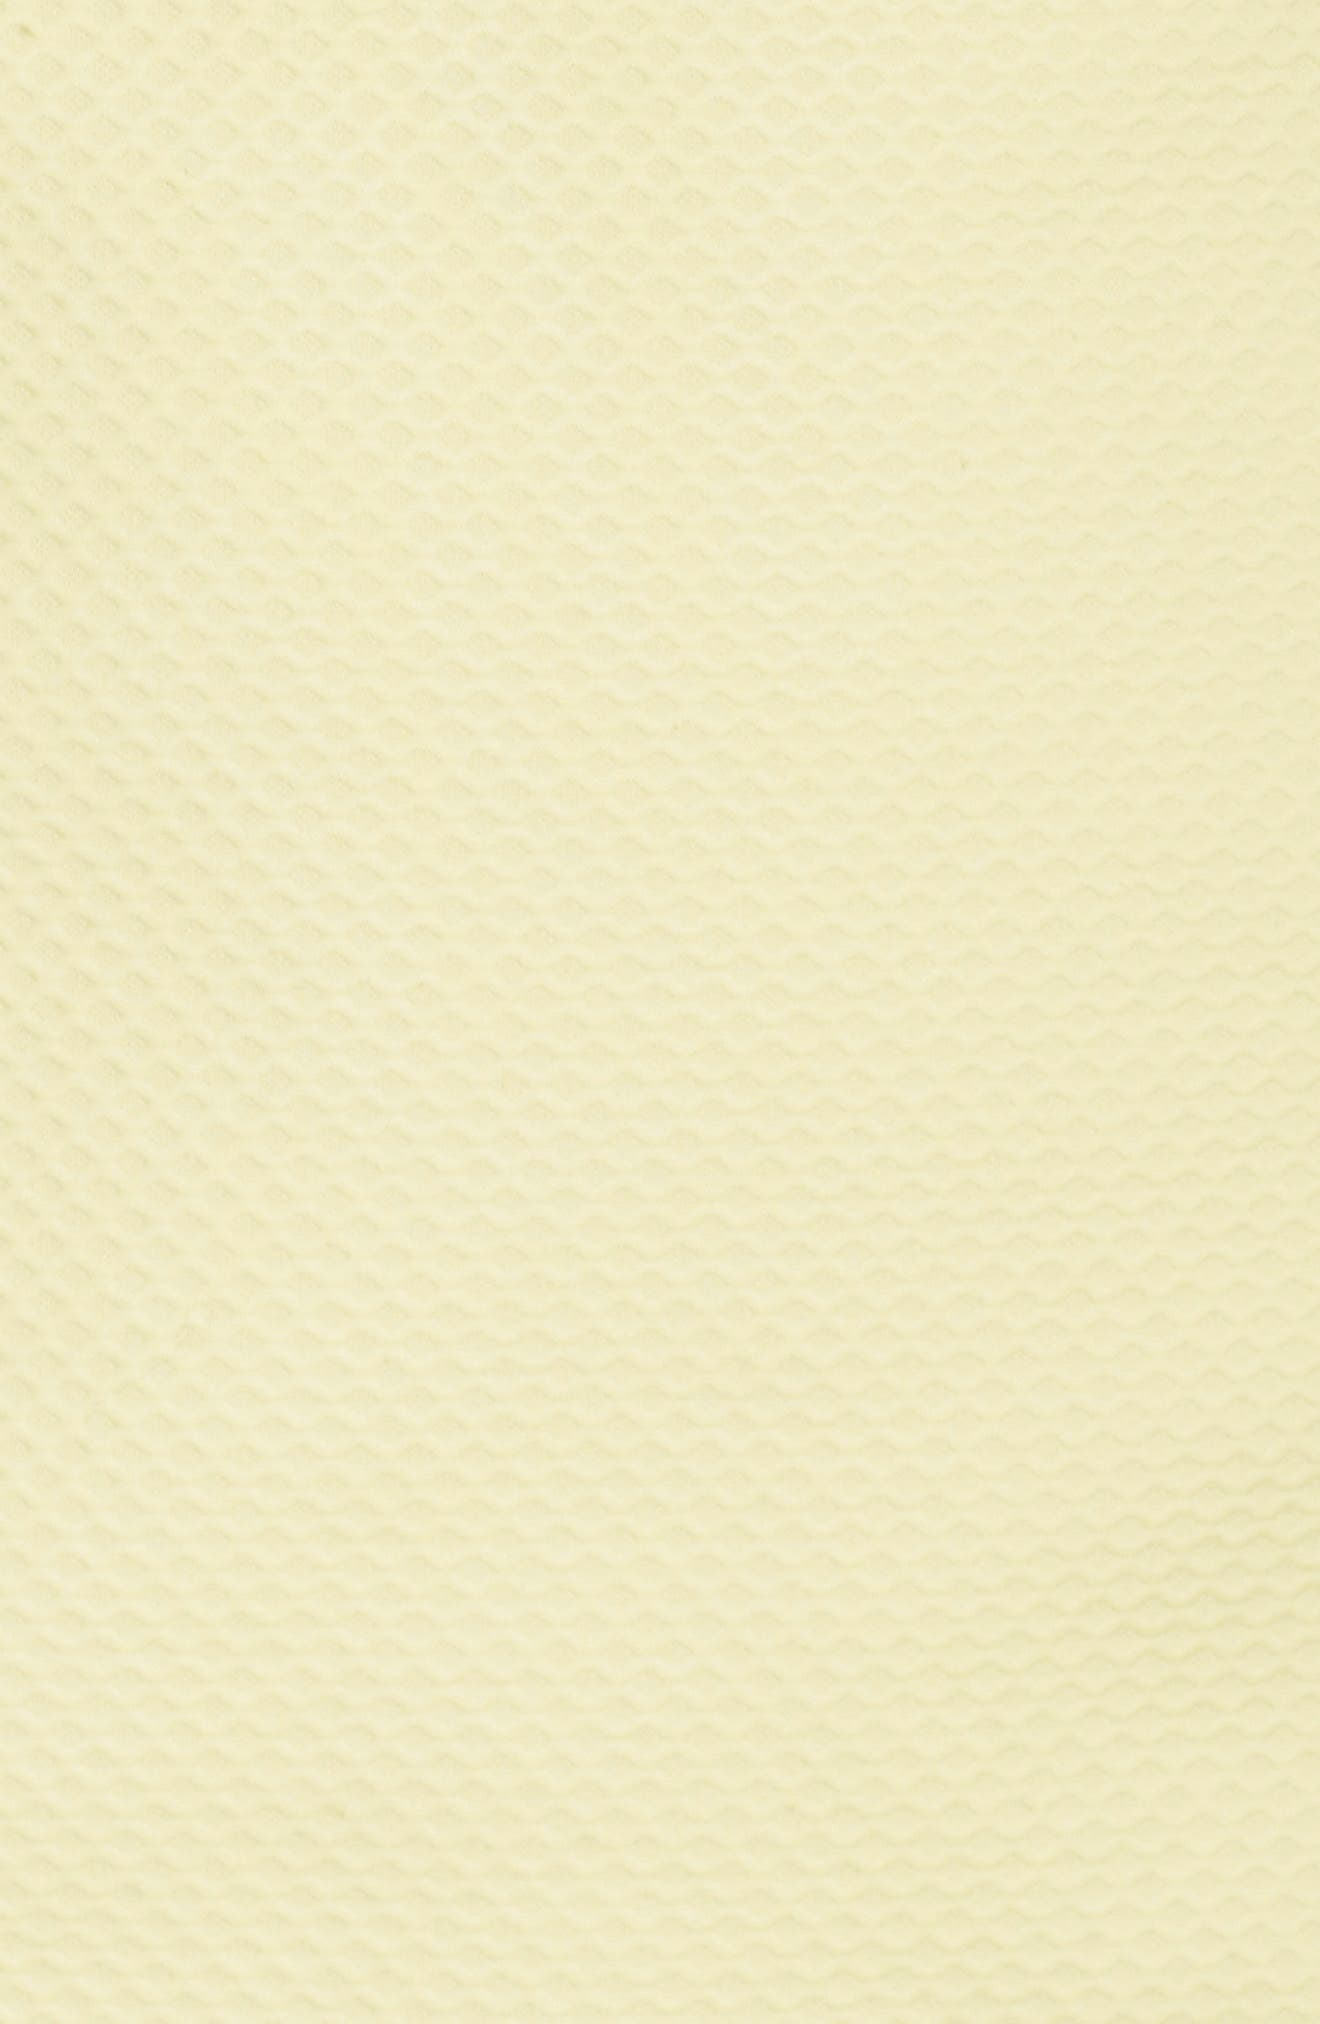 Sandi Stretch Minidress,                             Alternate thumbnail 5, color,                             Pineapple